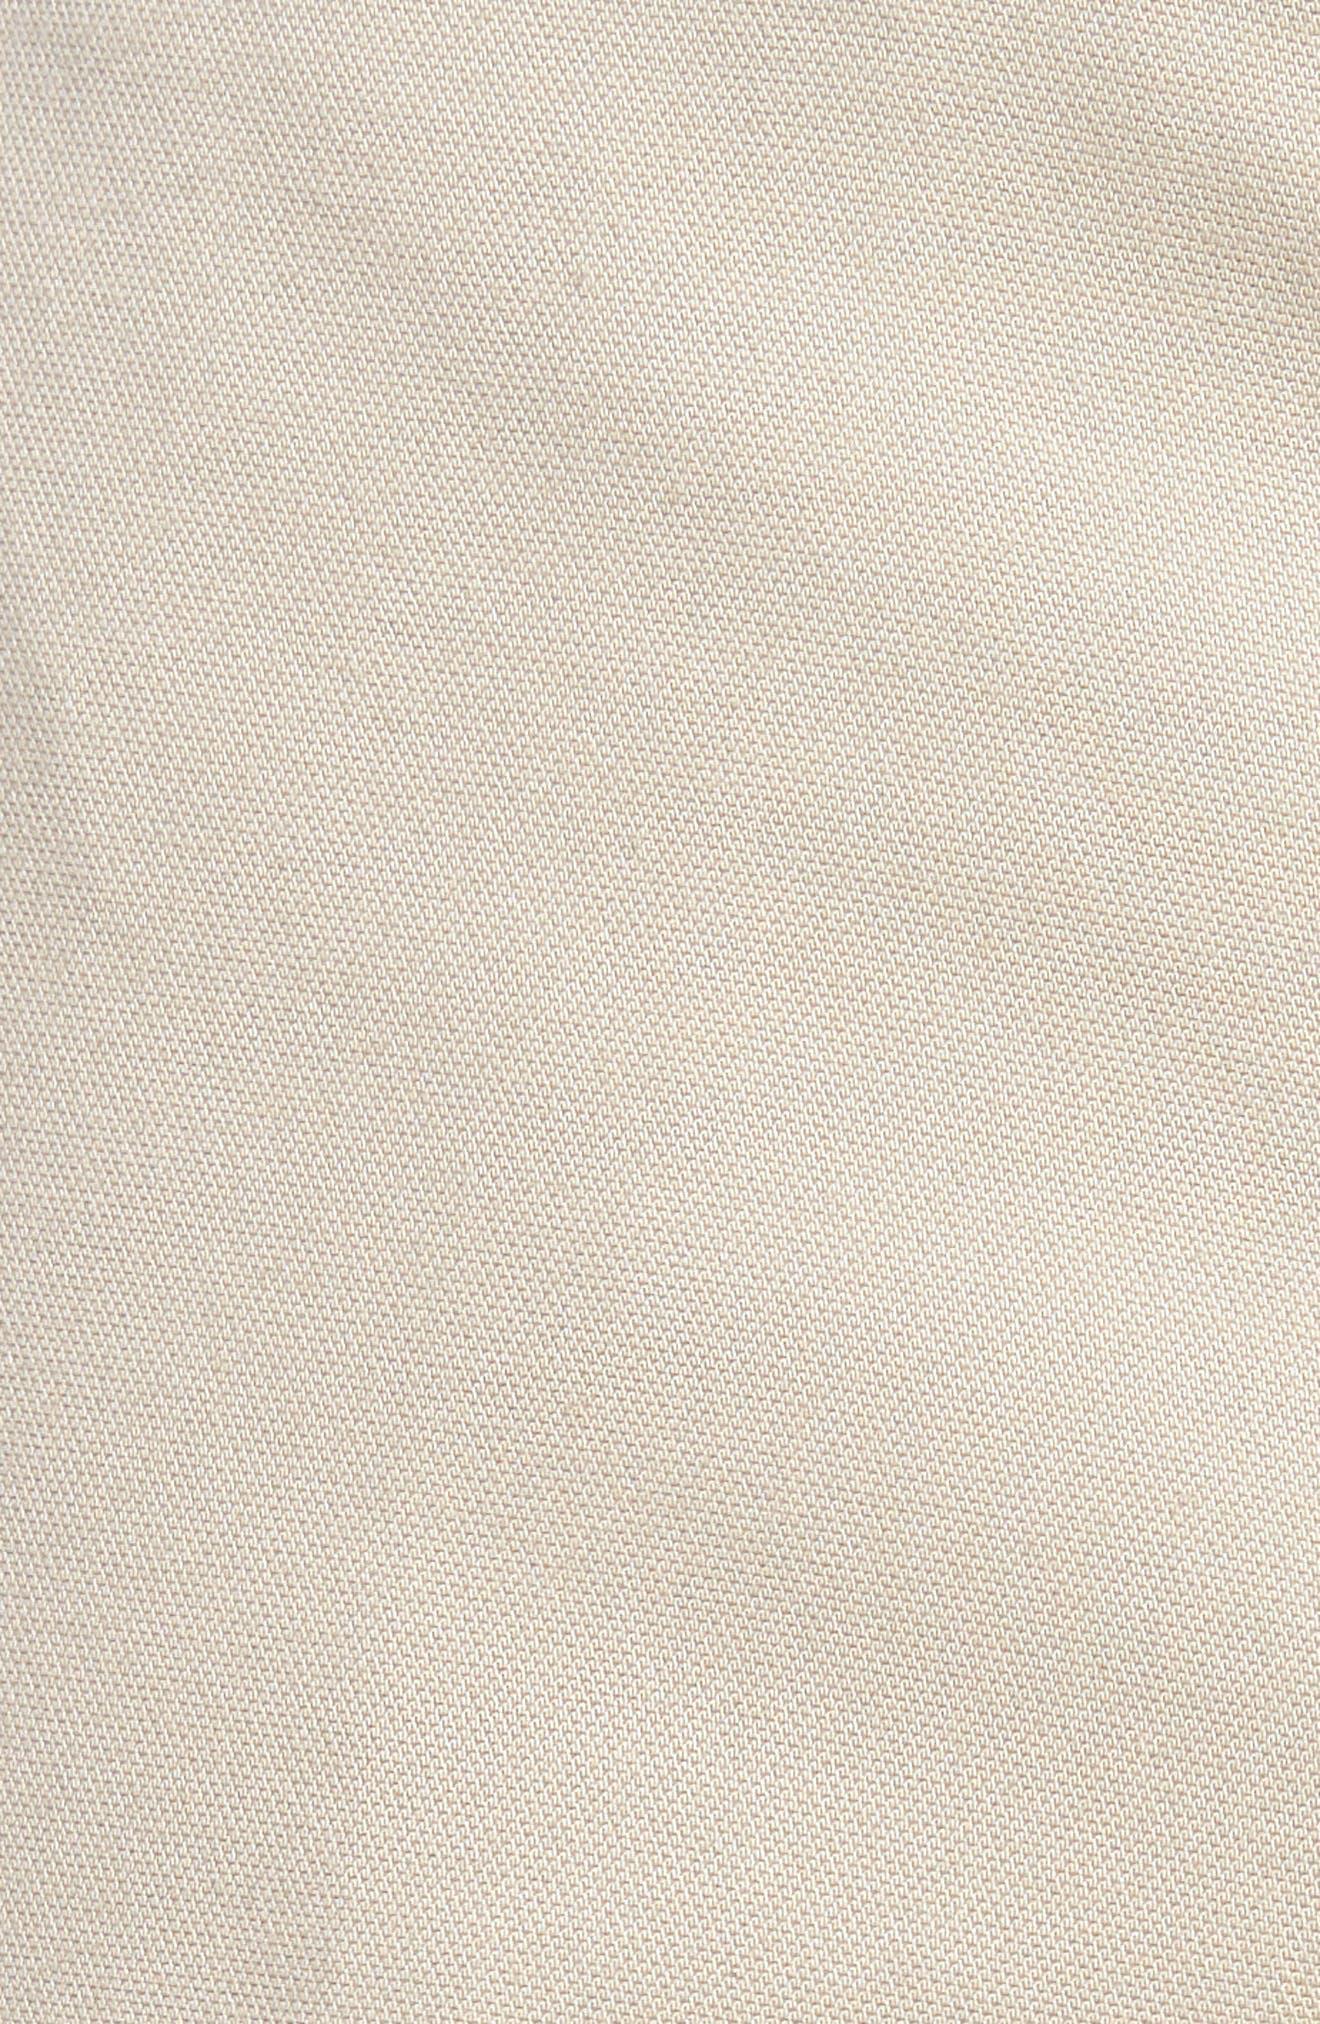 Finchley Regular Fit Pants,                             Alternate thumbnail 5, color,                             102